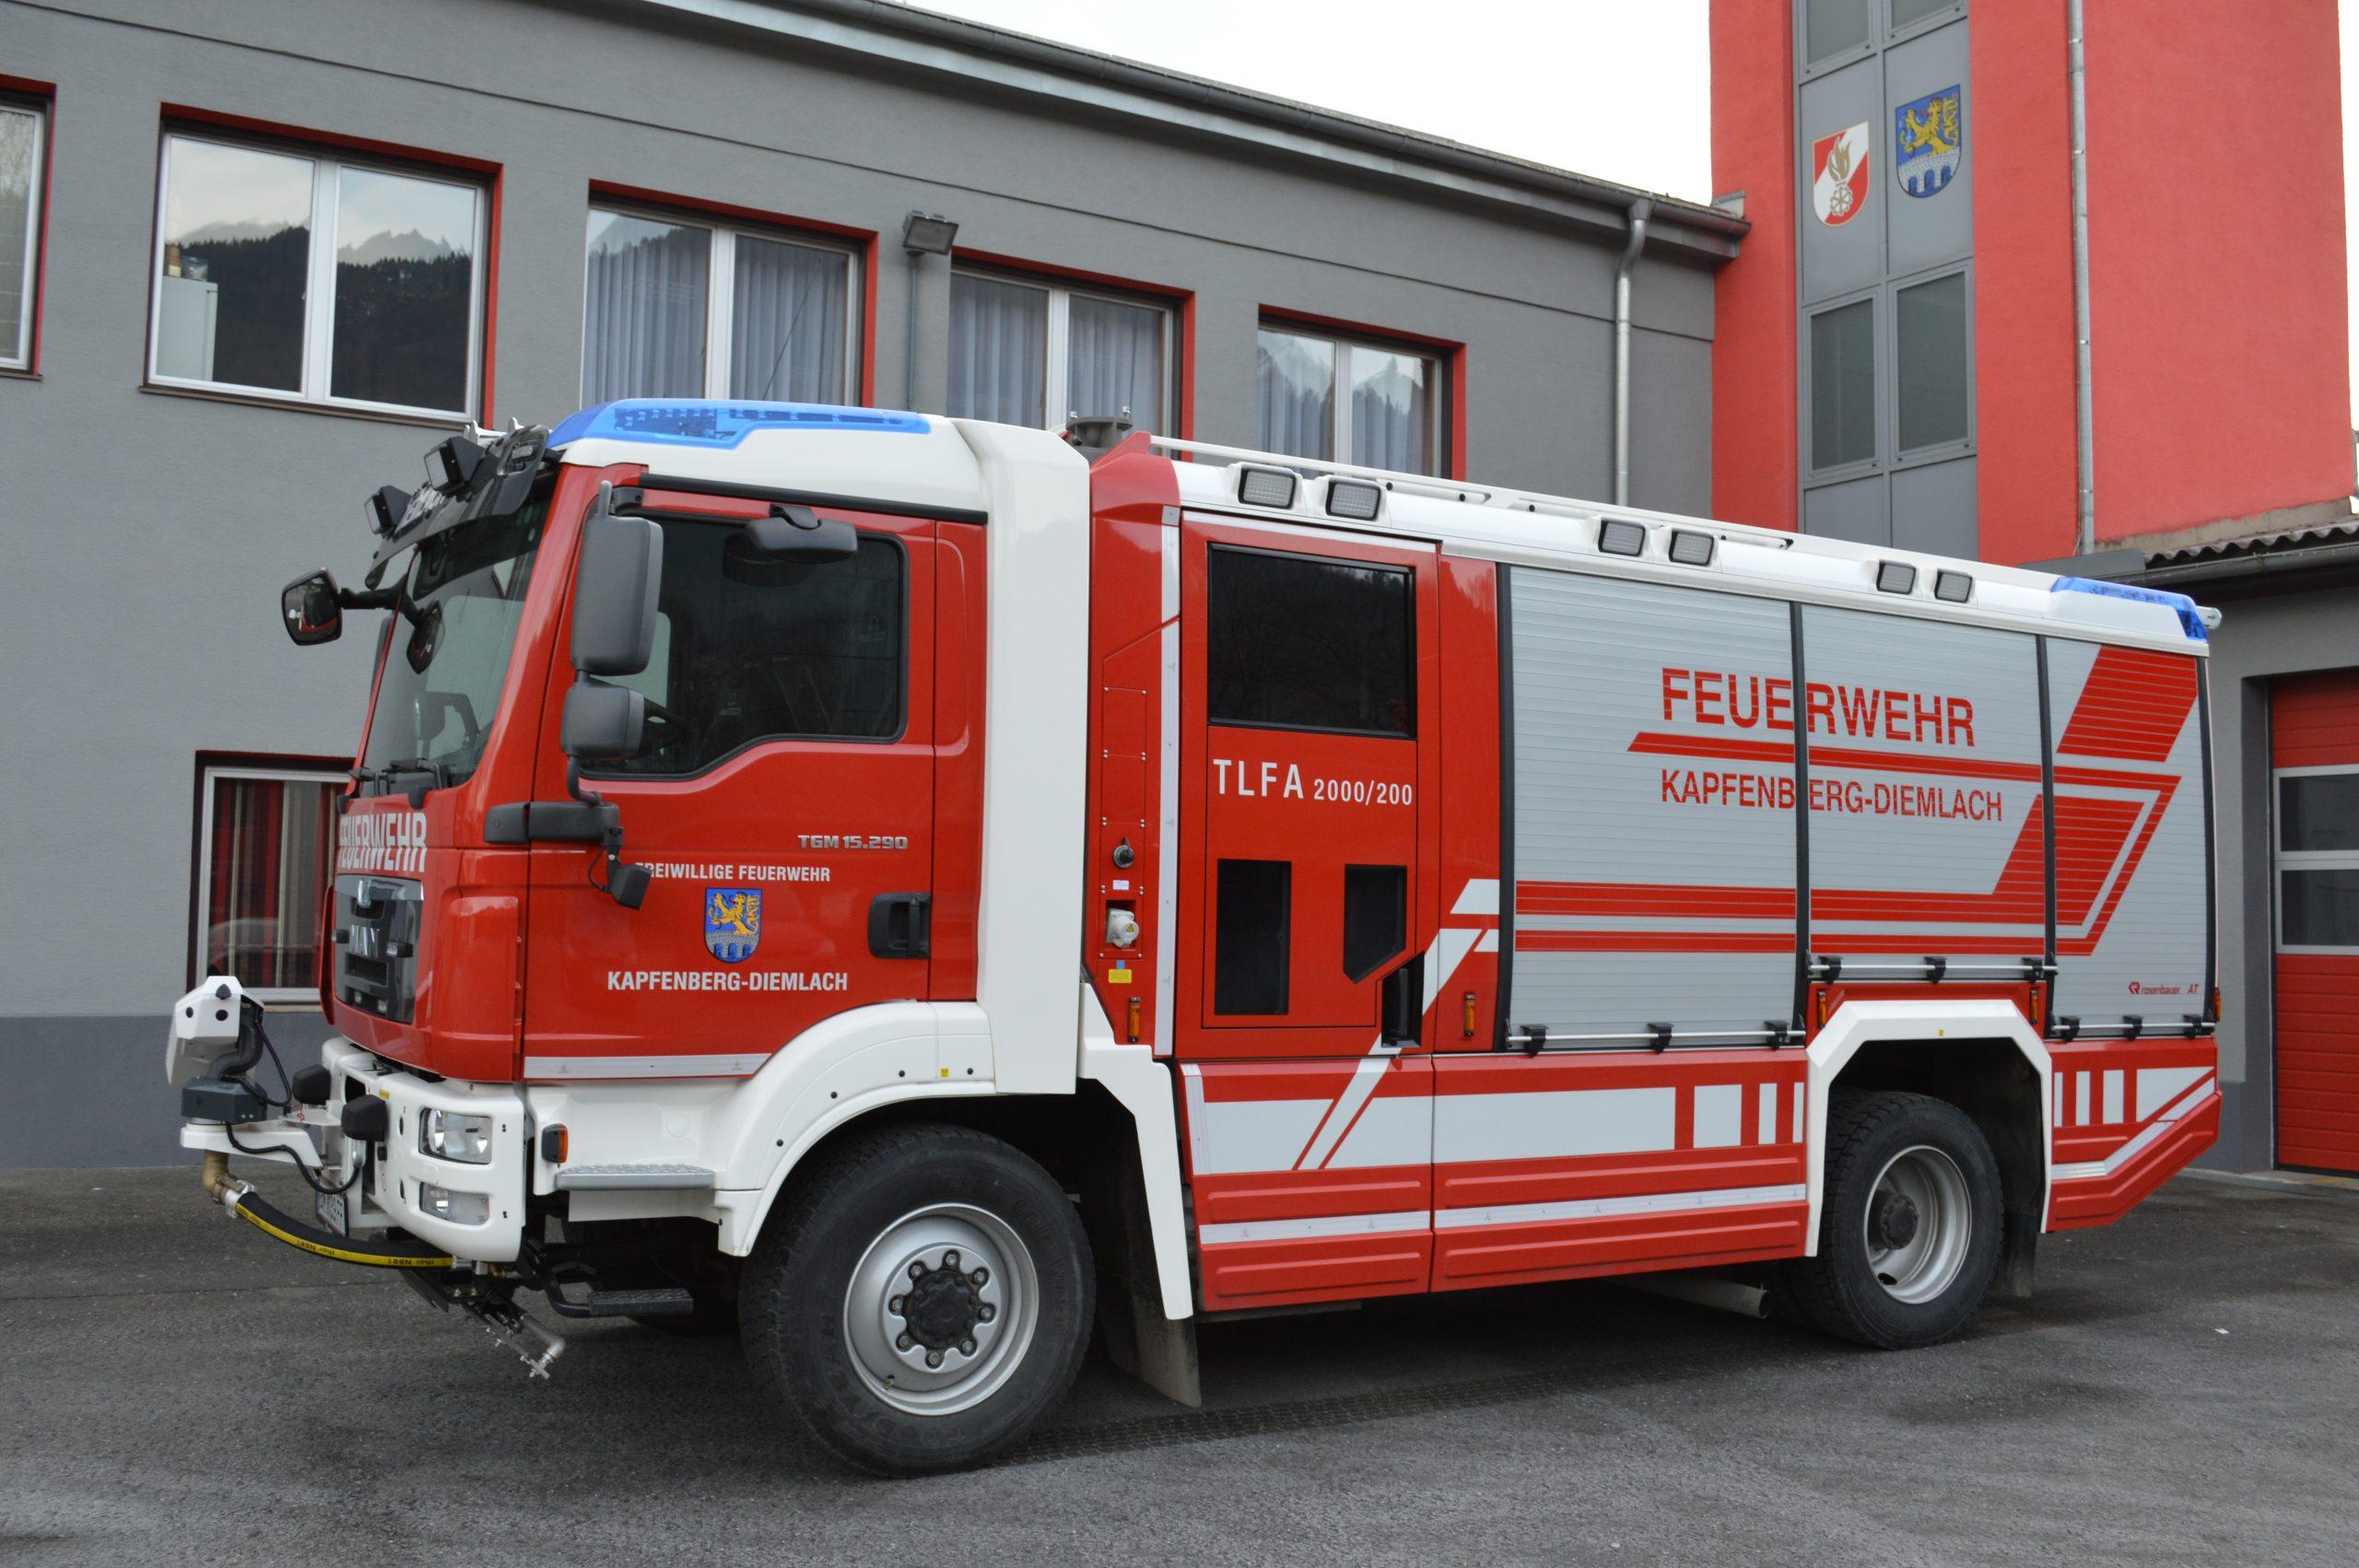 TLF-A-2000-200-scaled